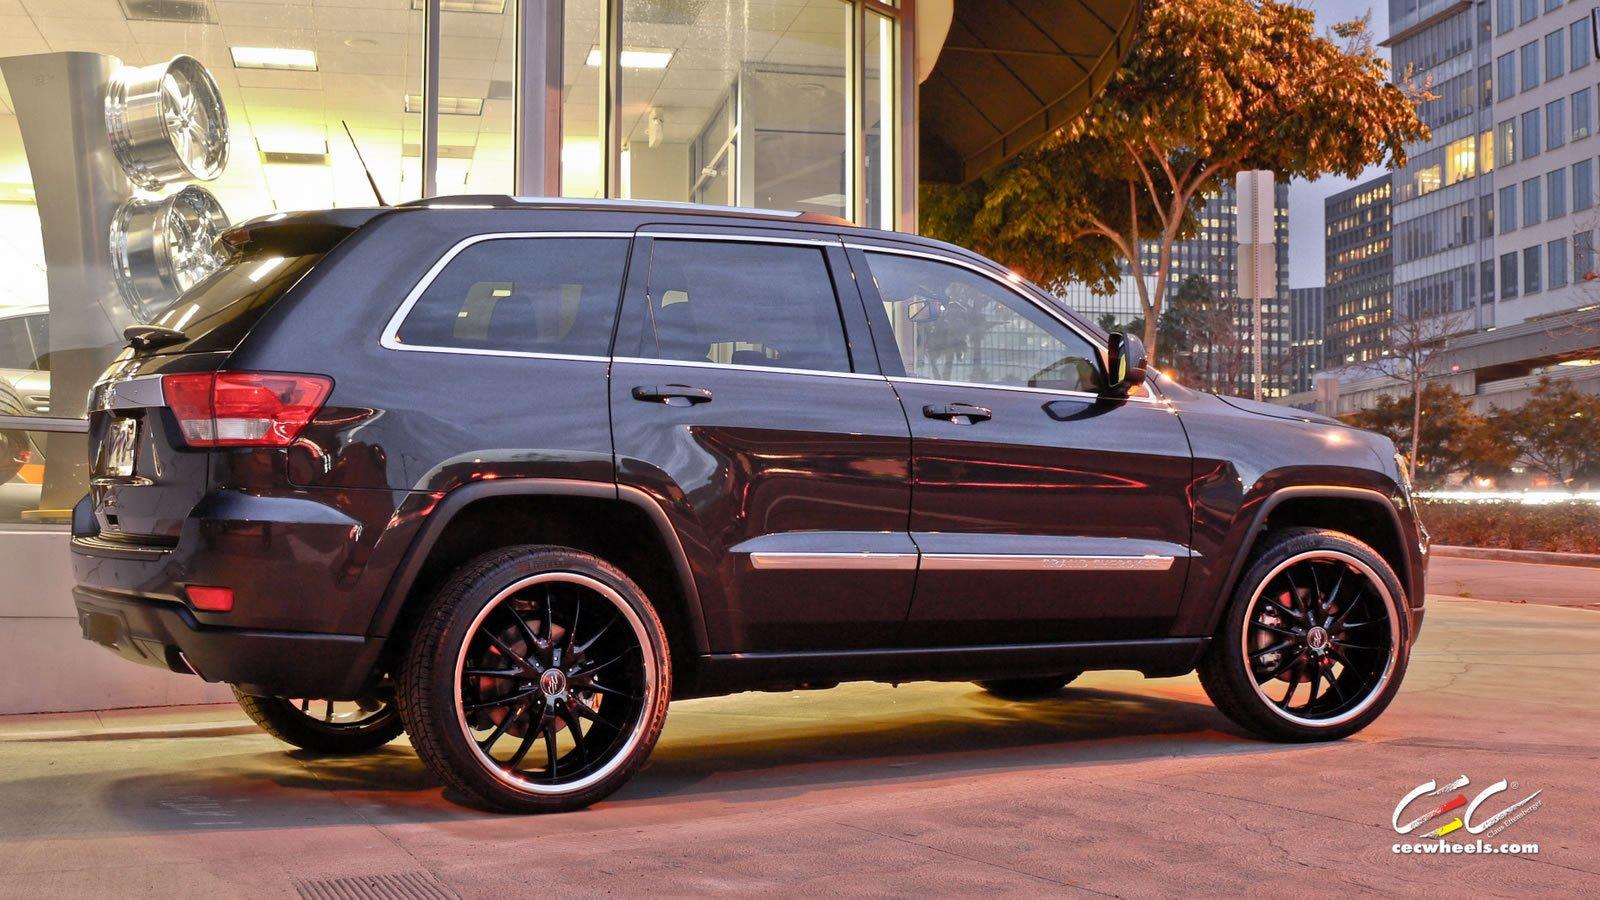 2015 cars cec jeep grand cherokee suv tuning wheels. Black Bedroom Furniture Sets. Home Design Ideas